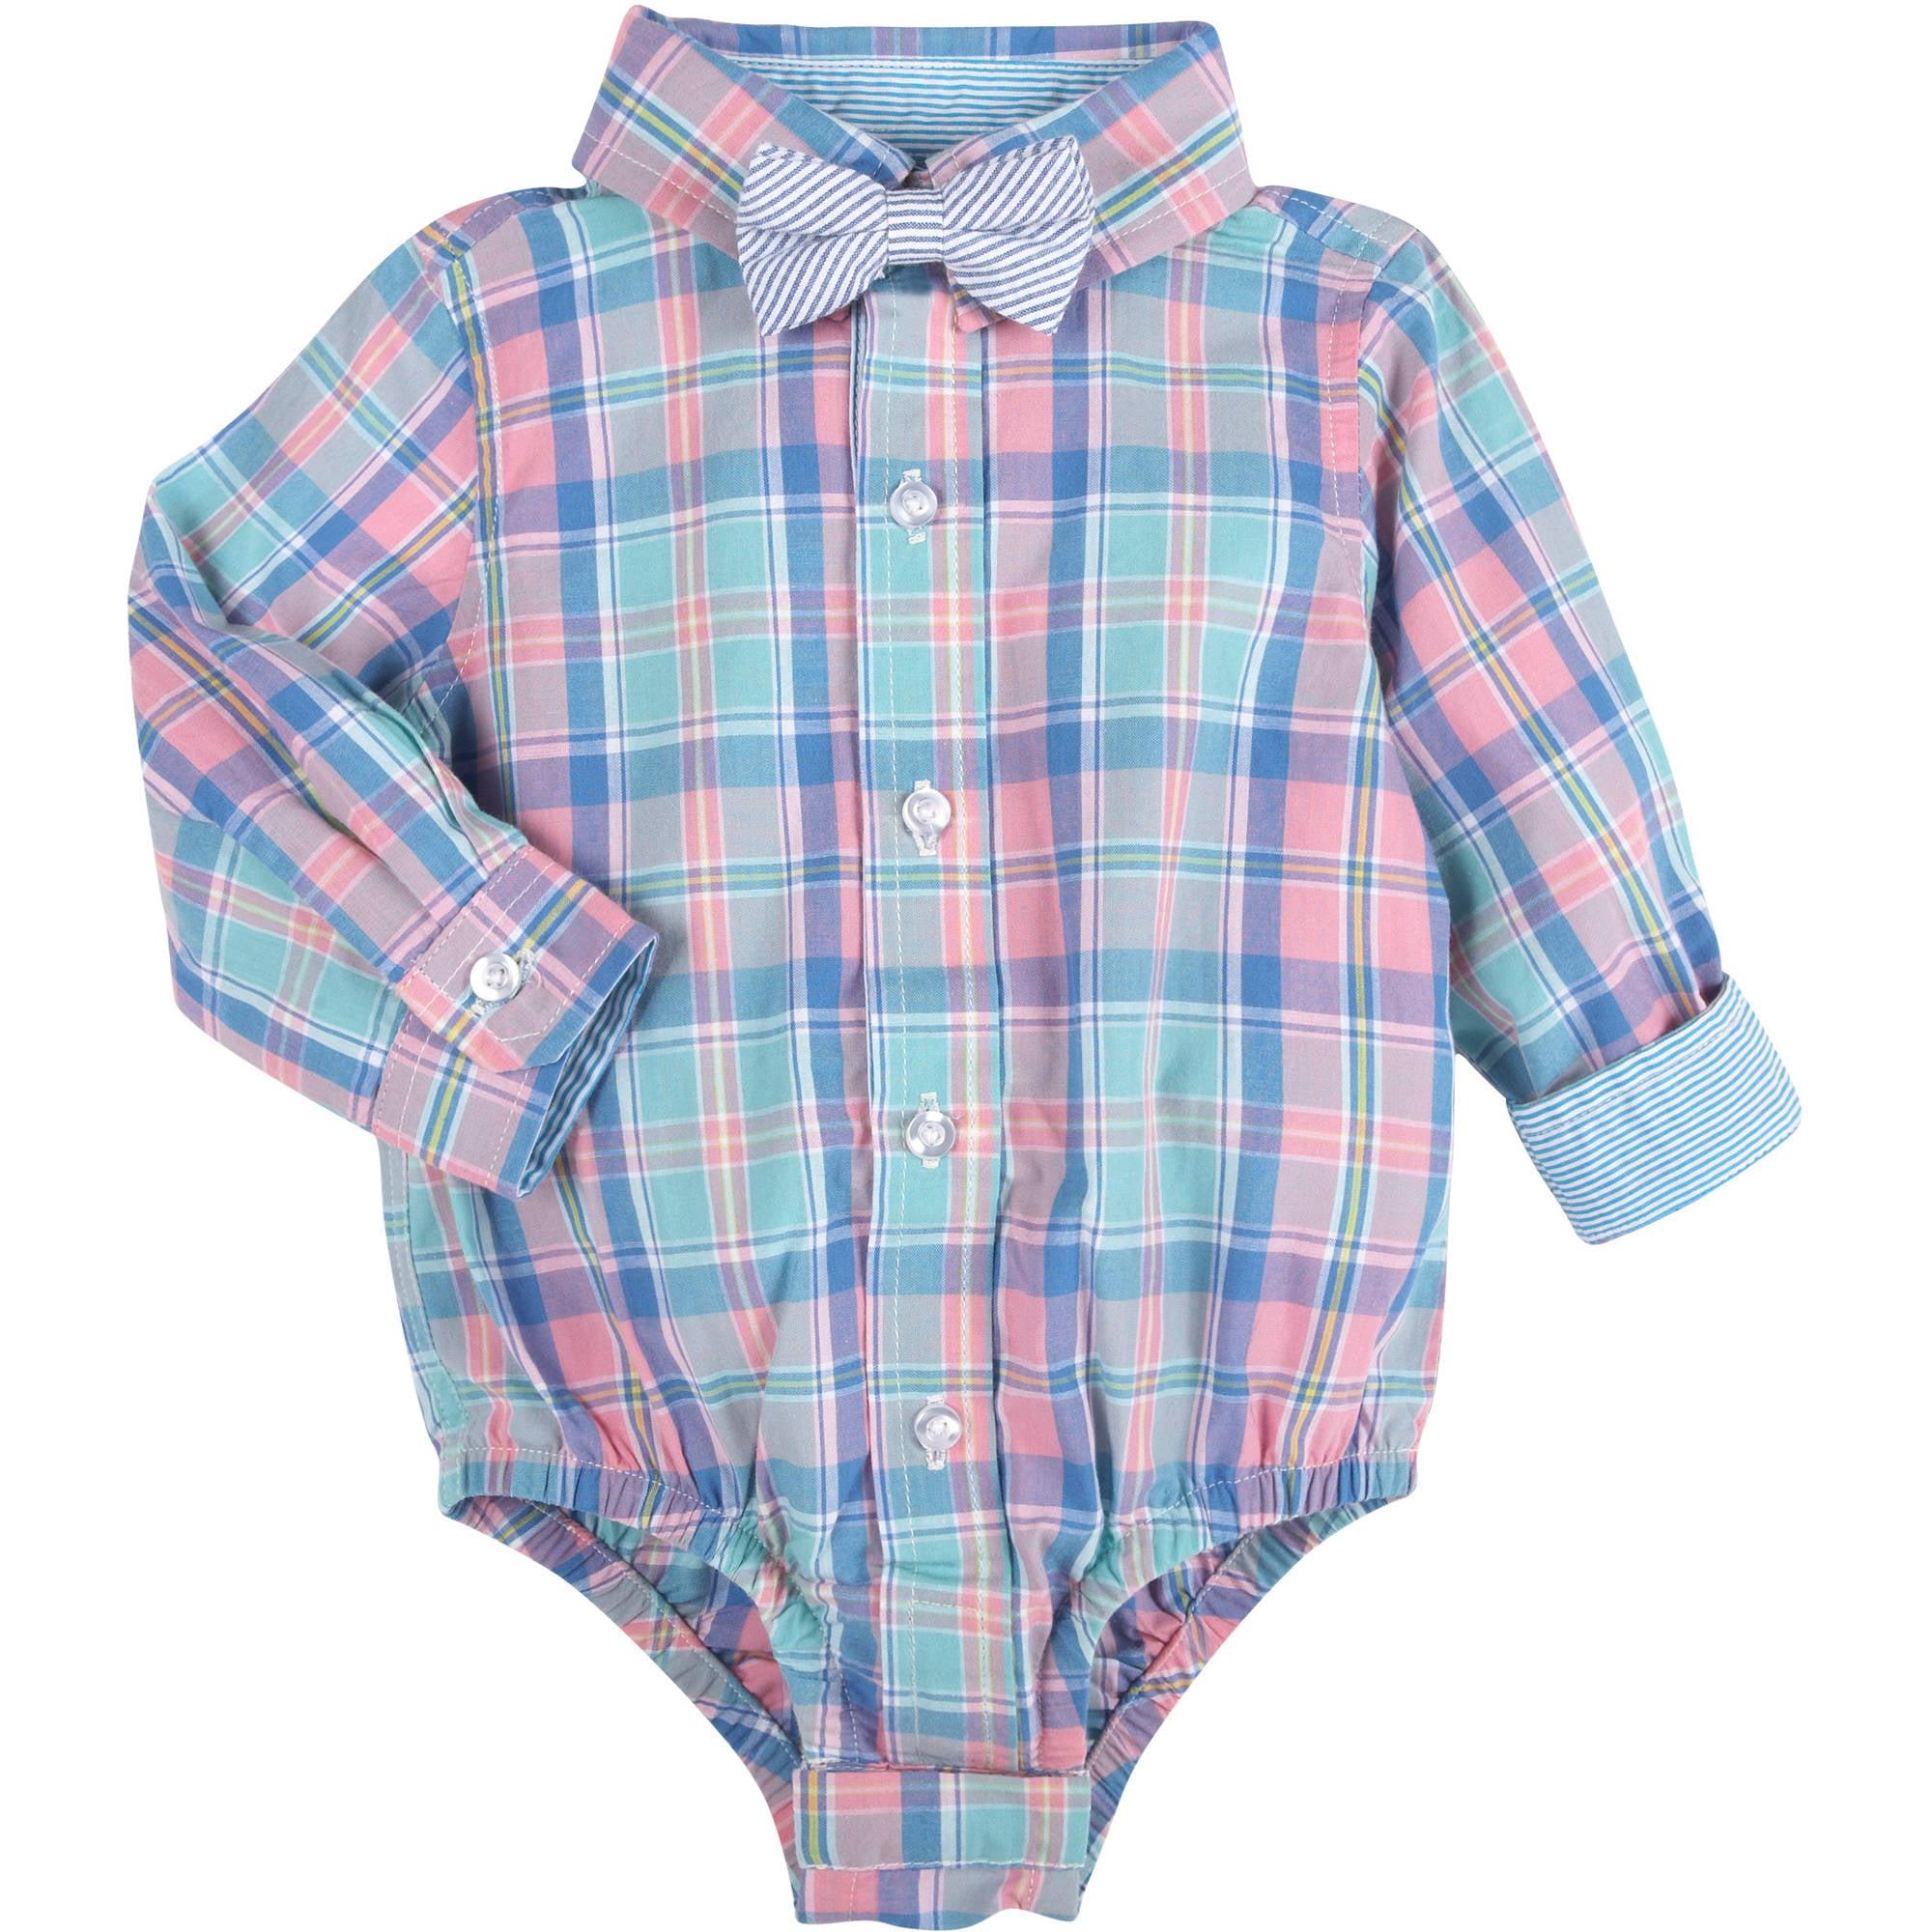 Newborn Baby Boys\' Aqua Plaid Shirt Bodysuit with Seersucker Bowtie ...